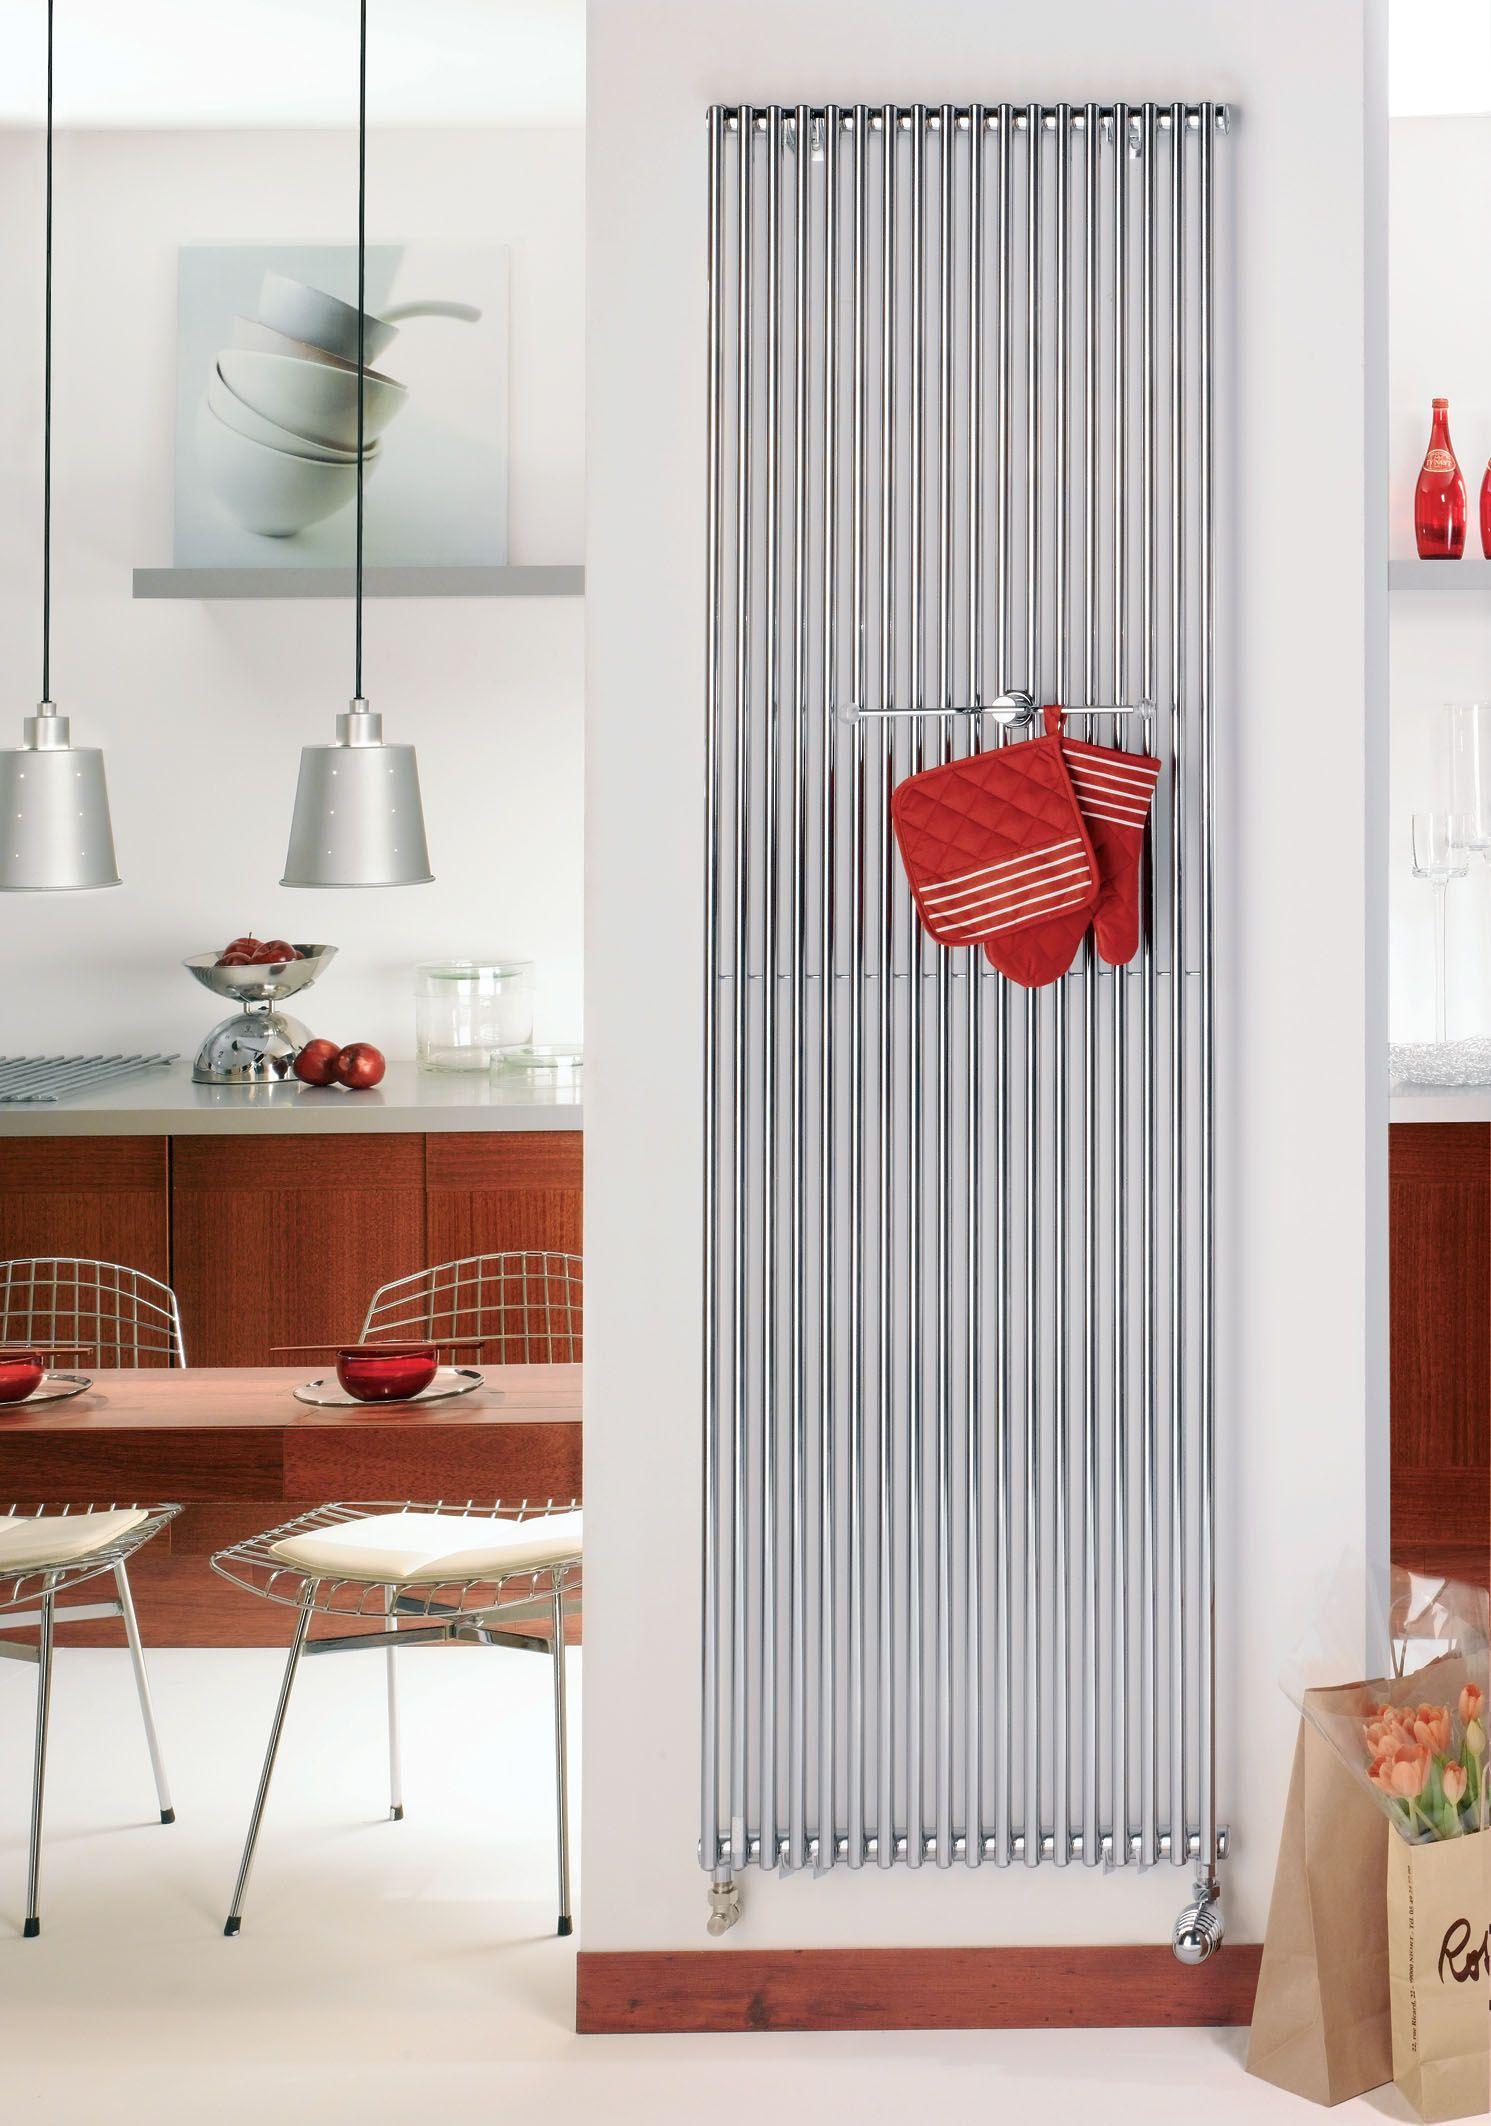 radiateur acova k va cuisines pinterest radiateur chauffage et chauffage central. Black Bedroom Furniture Sets. Home Design Ideas